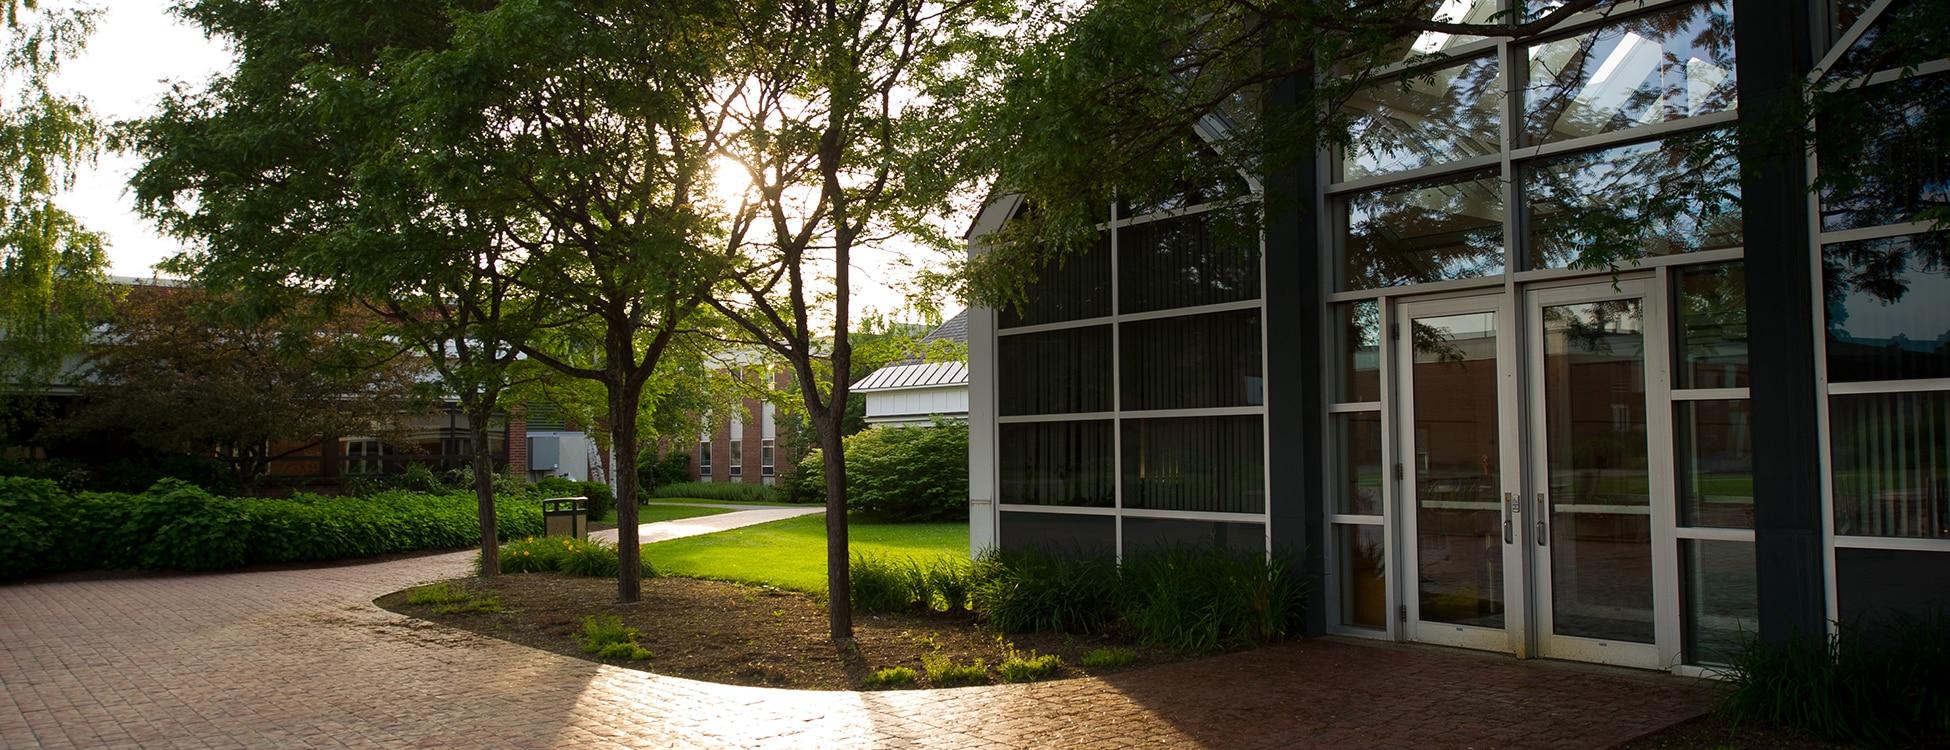 Administration building, Randolph Center campus, plaza, patio, sunset